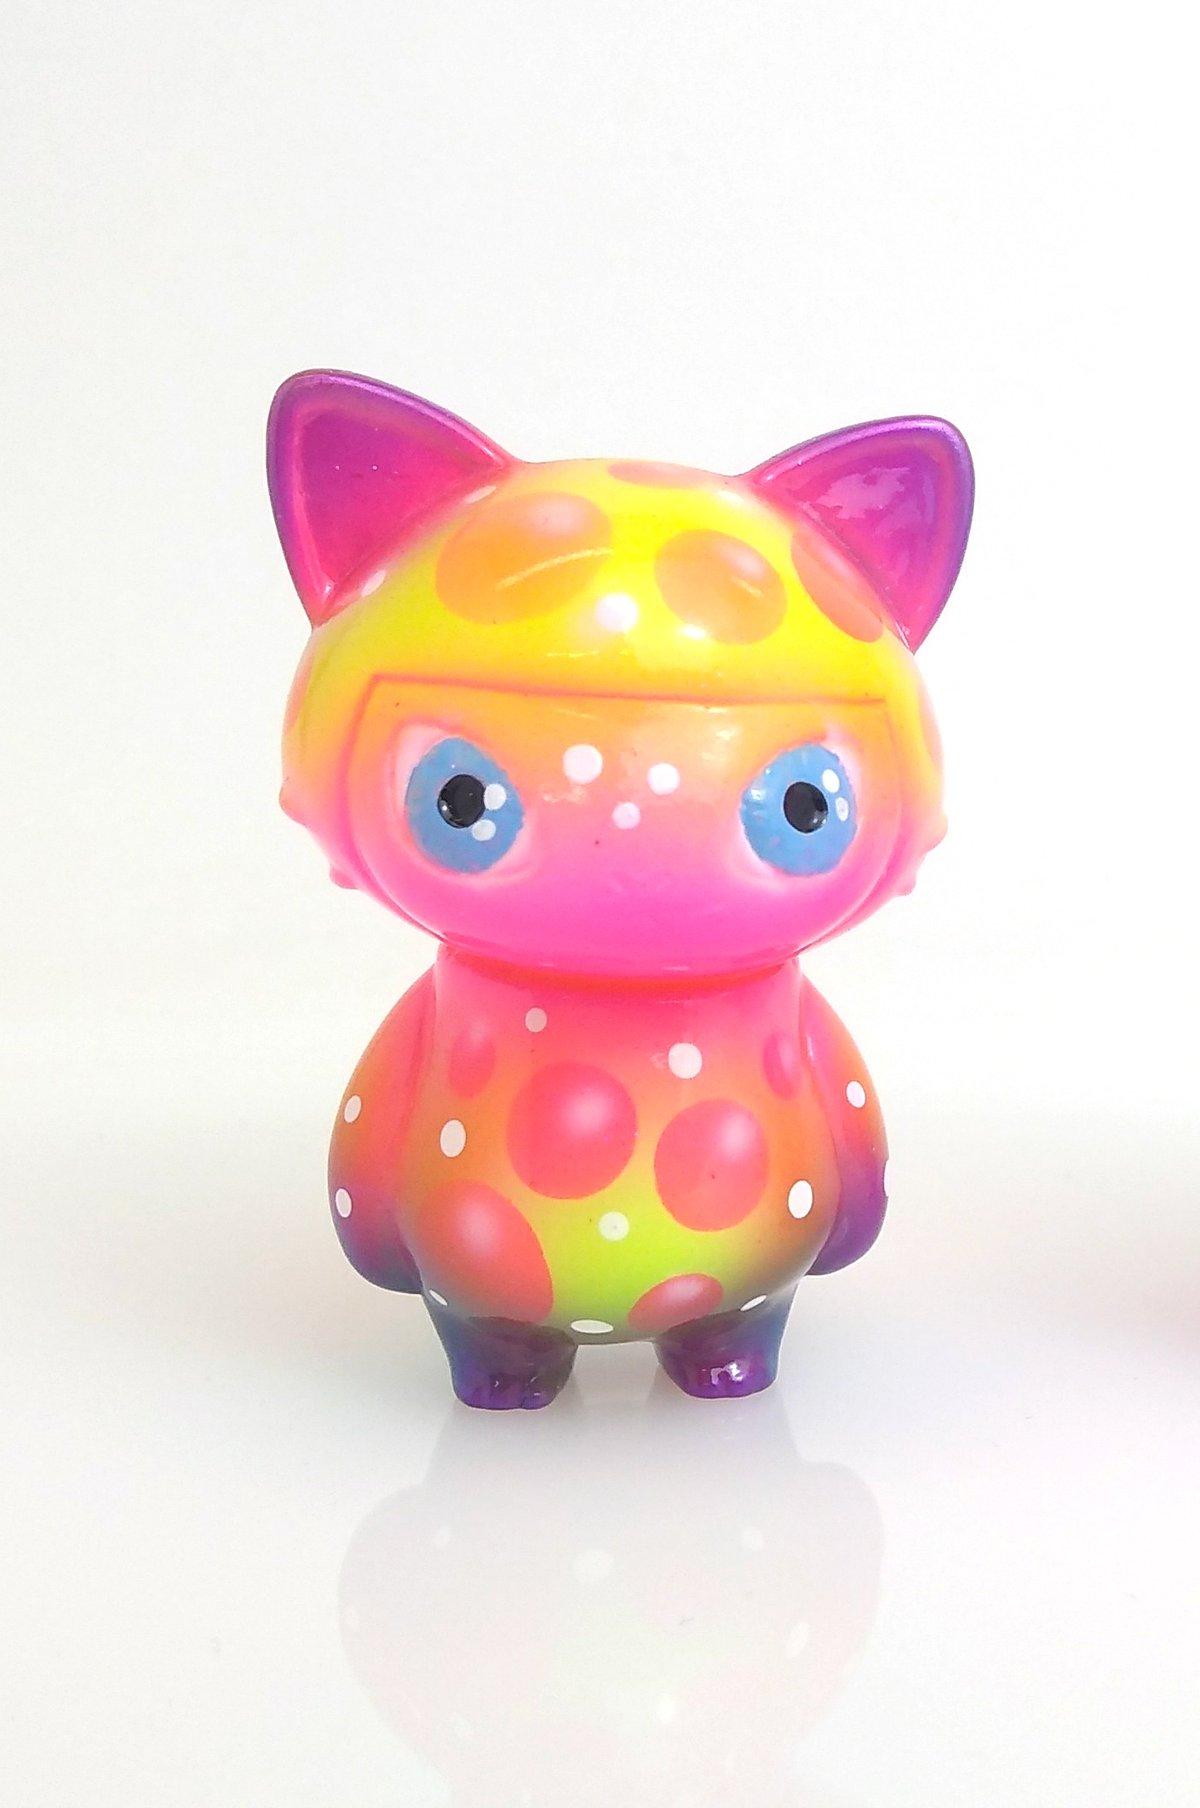 Image of Neon Bubbles Nyancocco custom